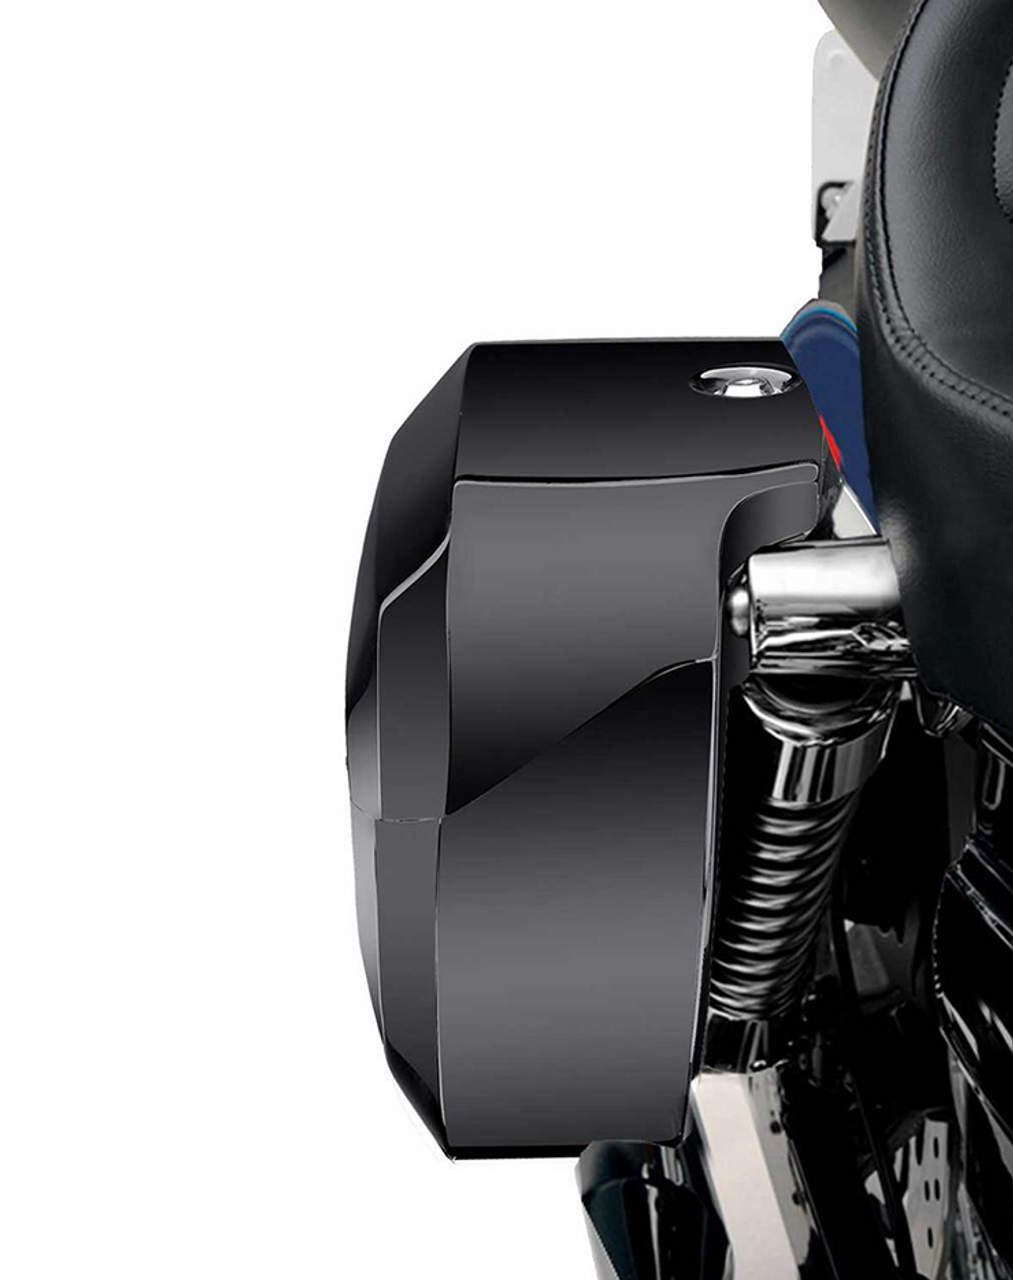 Kawasaki Vulcan 750, VN750 Viking Lamellar Large Spear Shock Cutout Hard Saddlebags Shock Cutout View